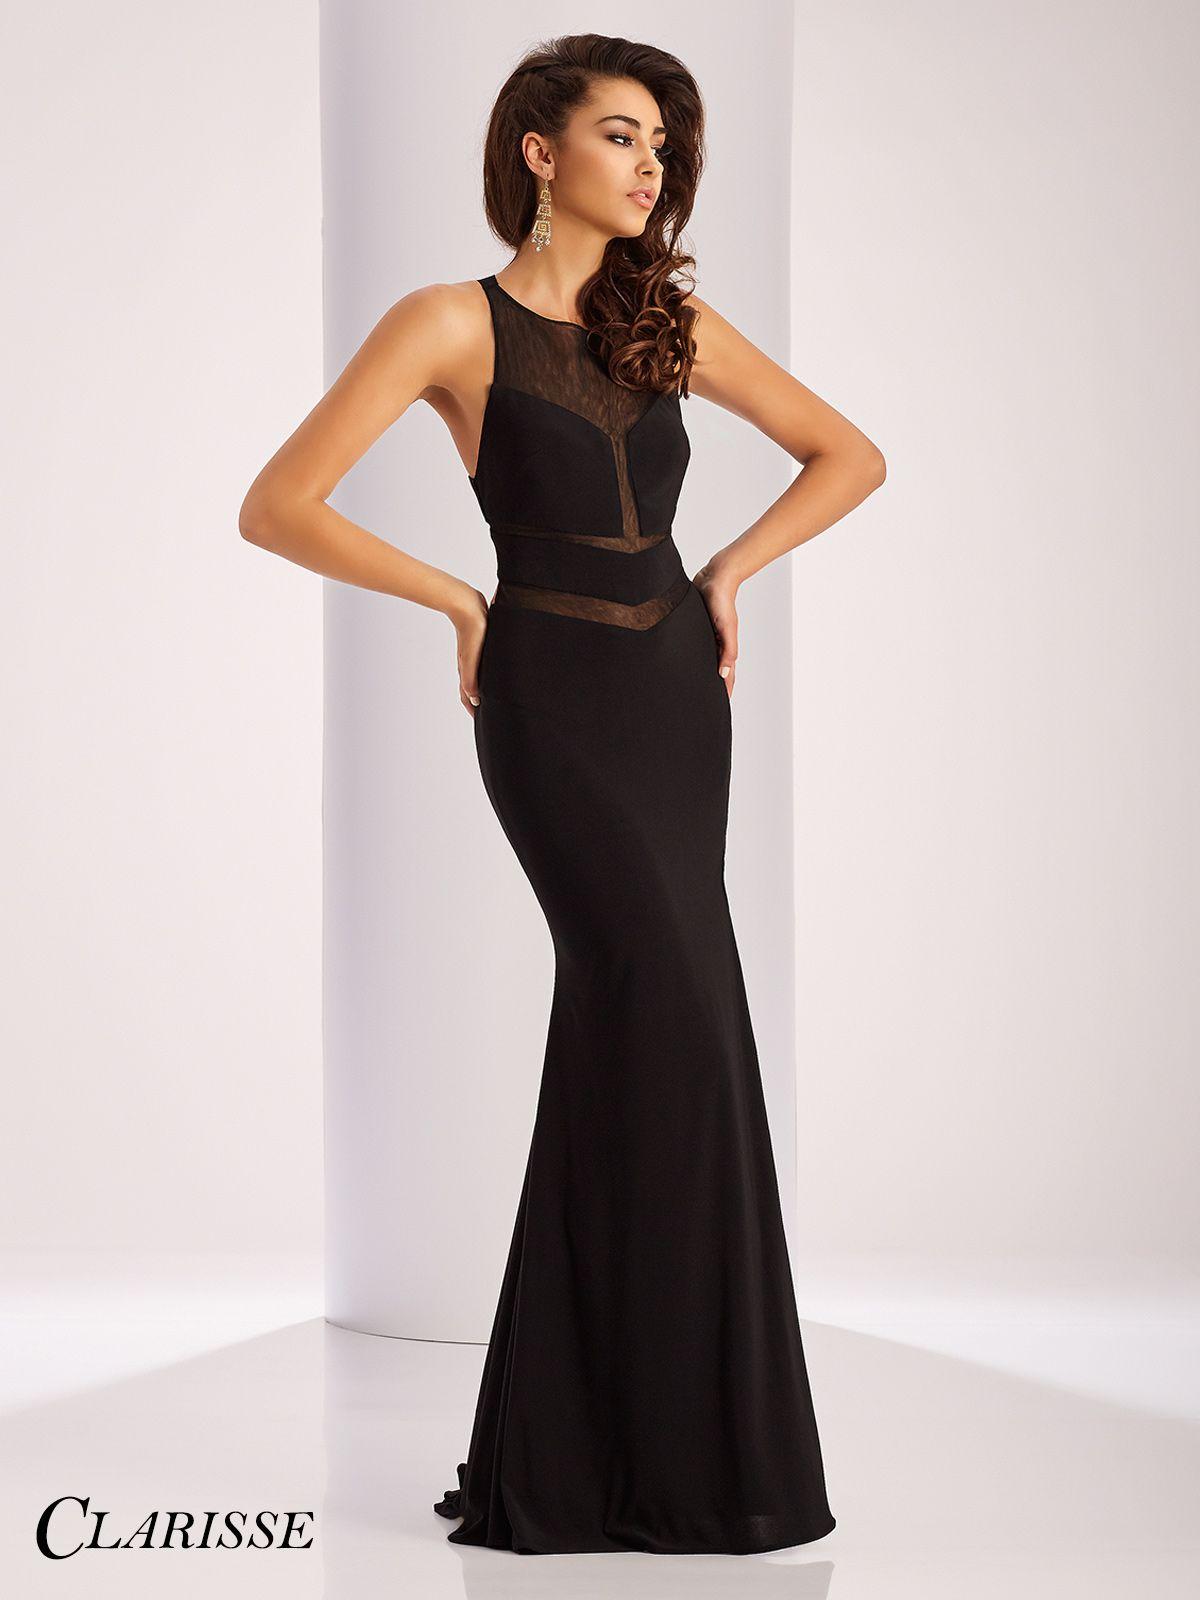 Clarisse prom dress sleeveless prom dress with sheer mesh